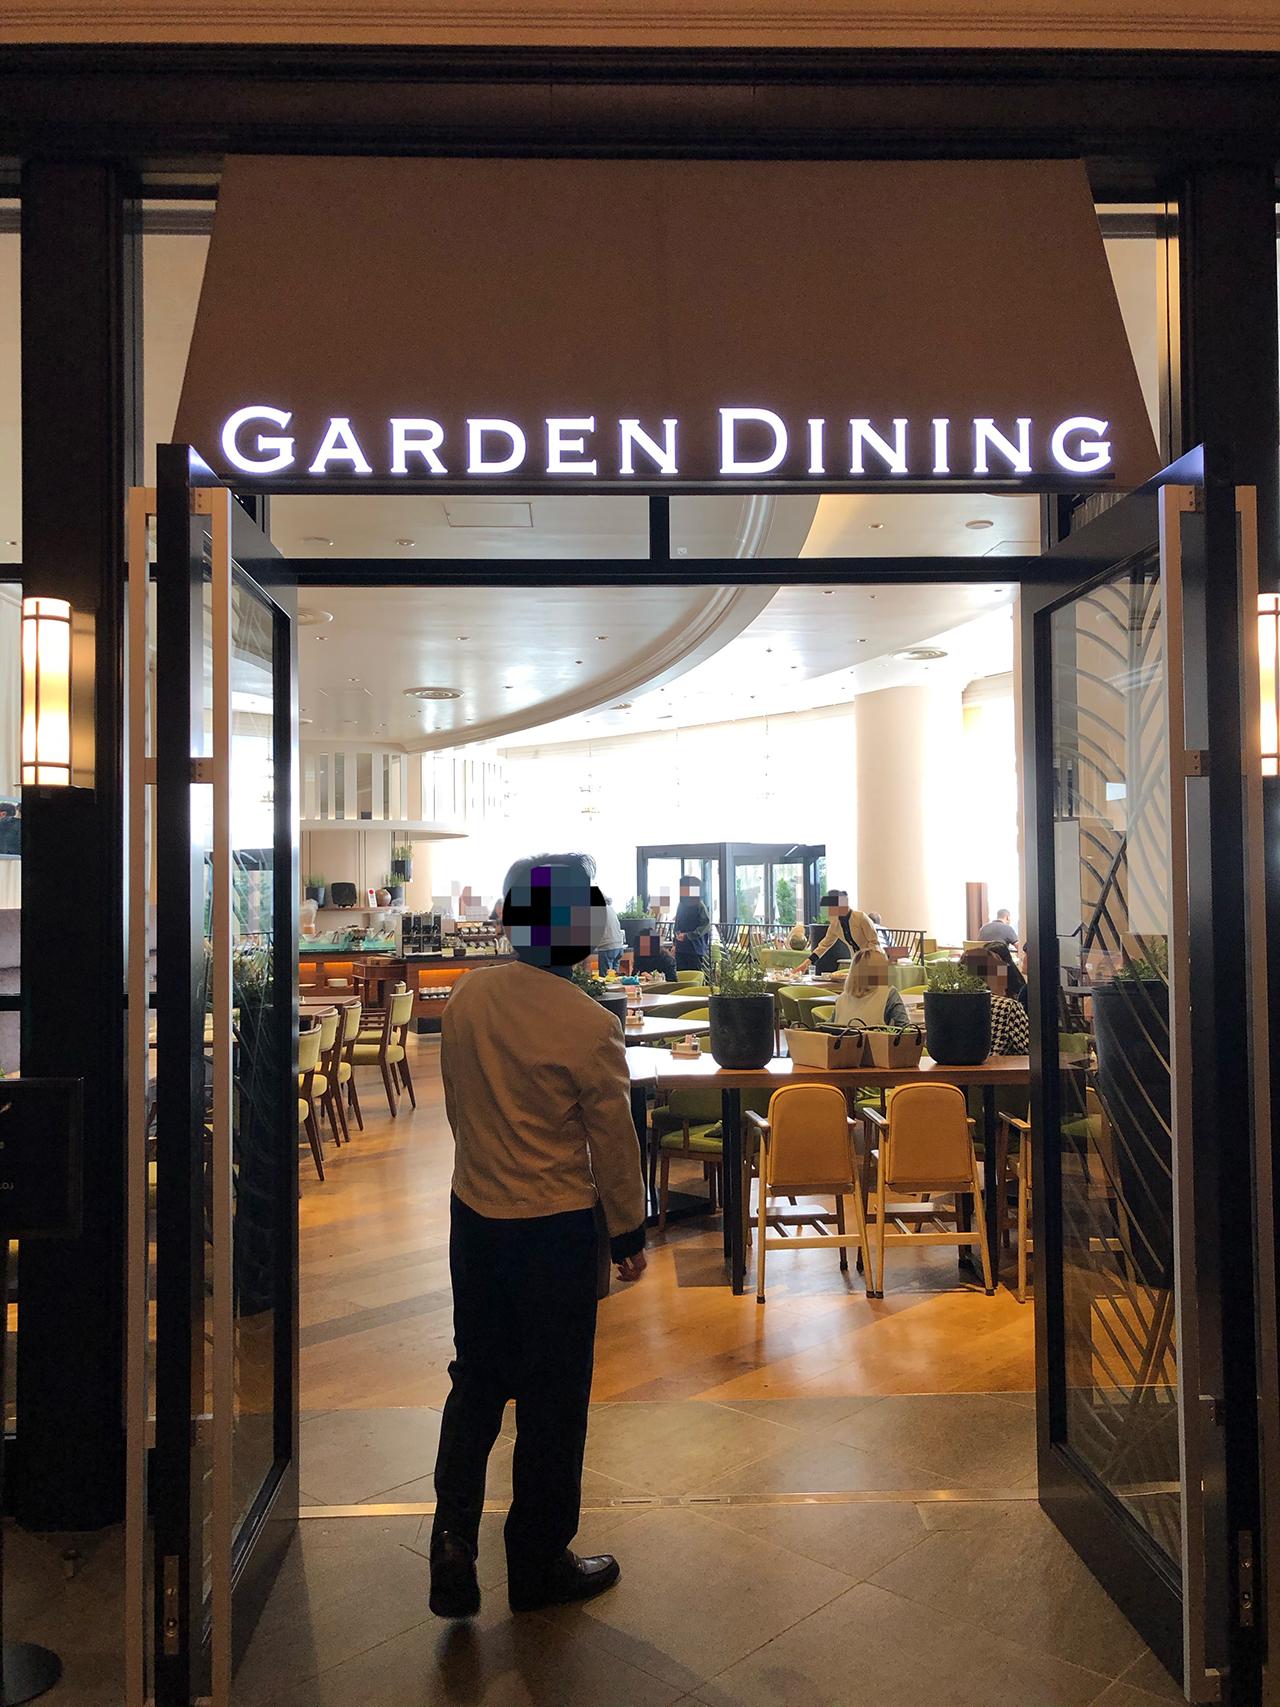 GARDEN DINING(ガーデン ダイニング)の外観